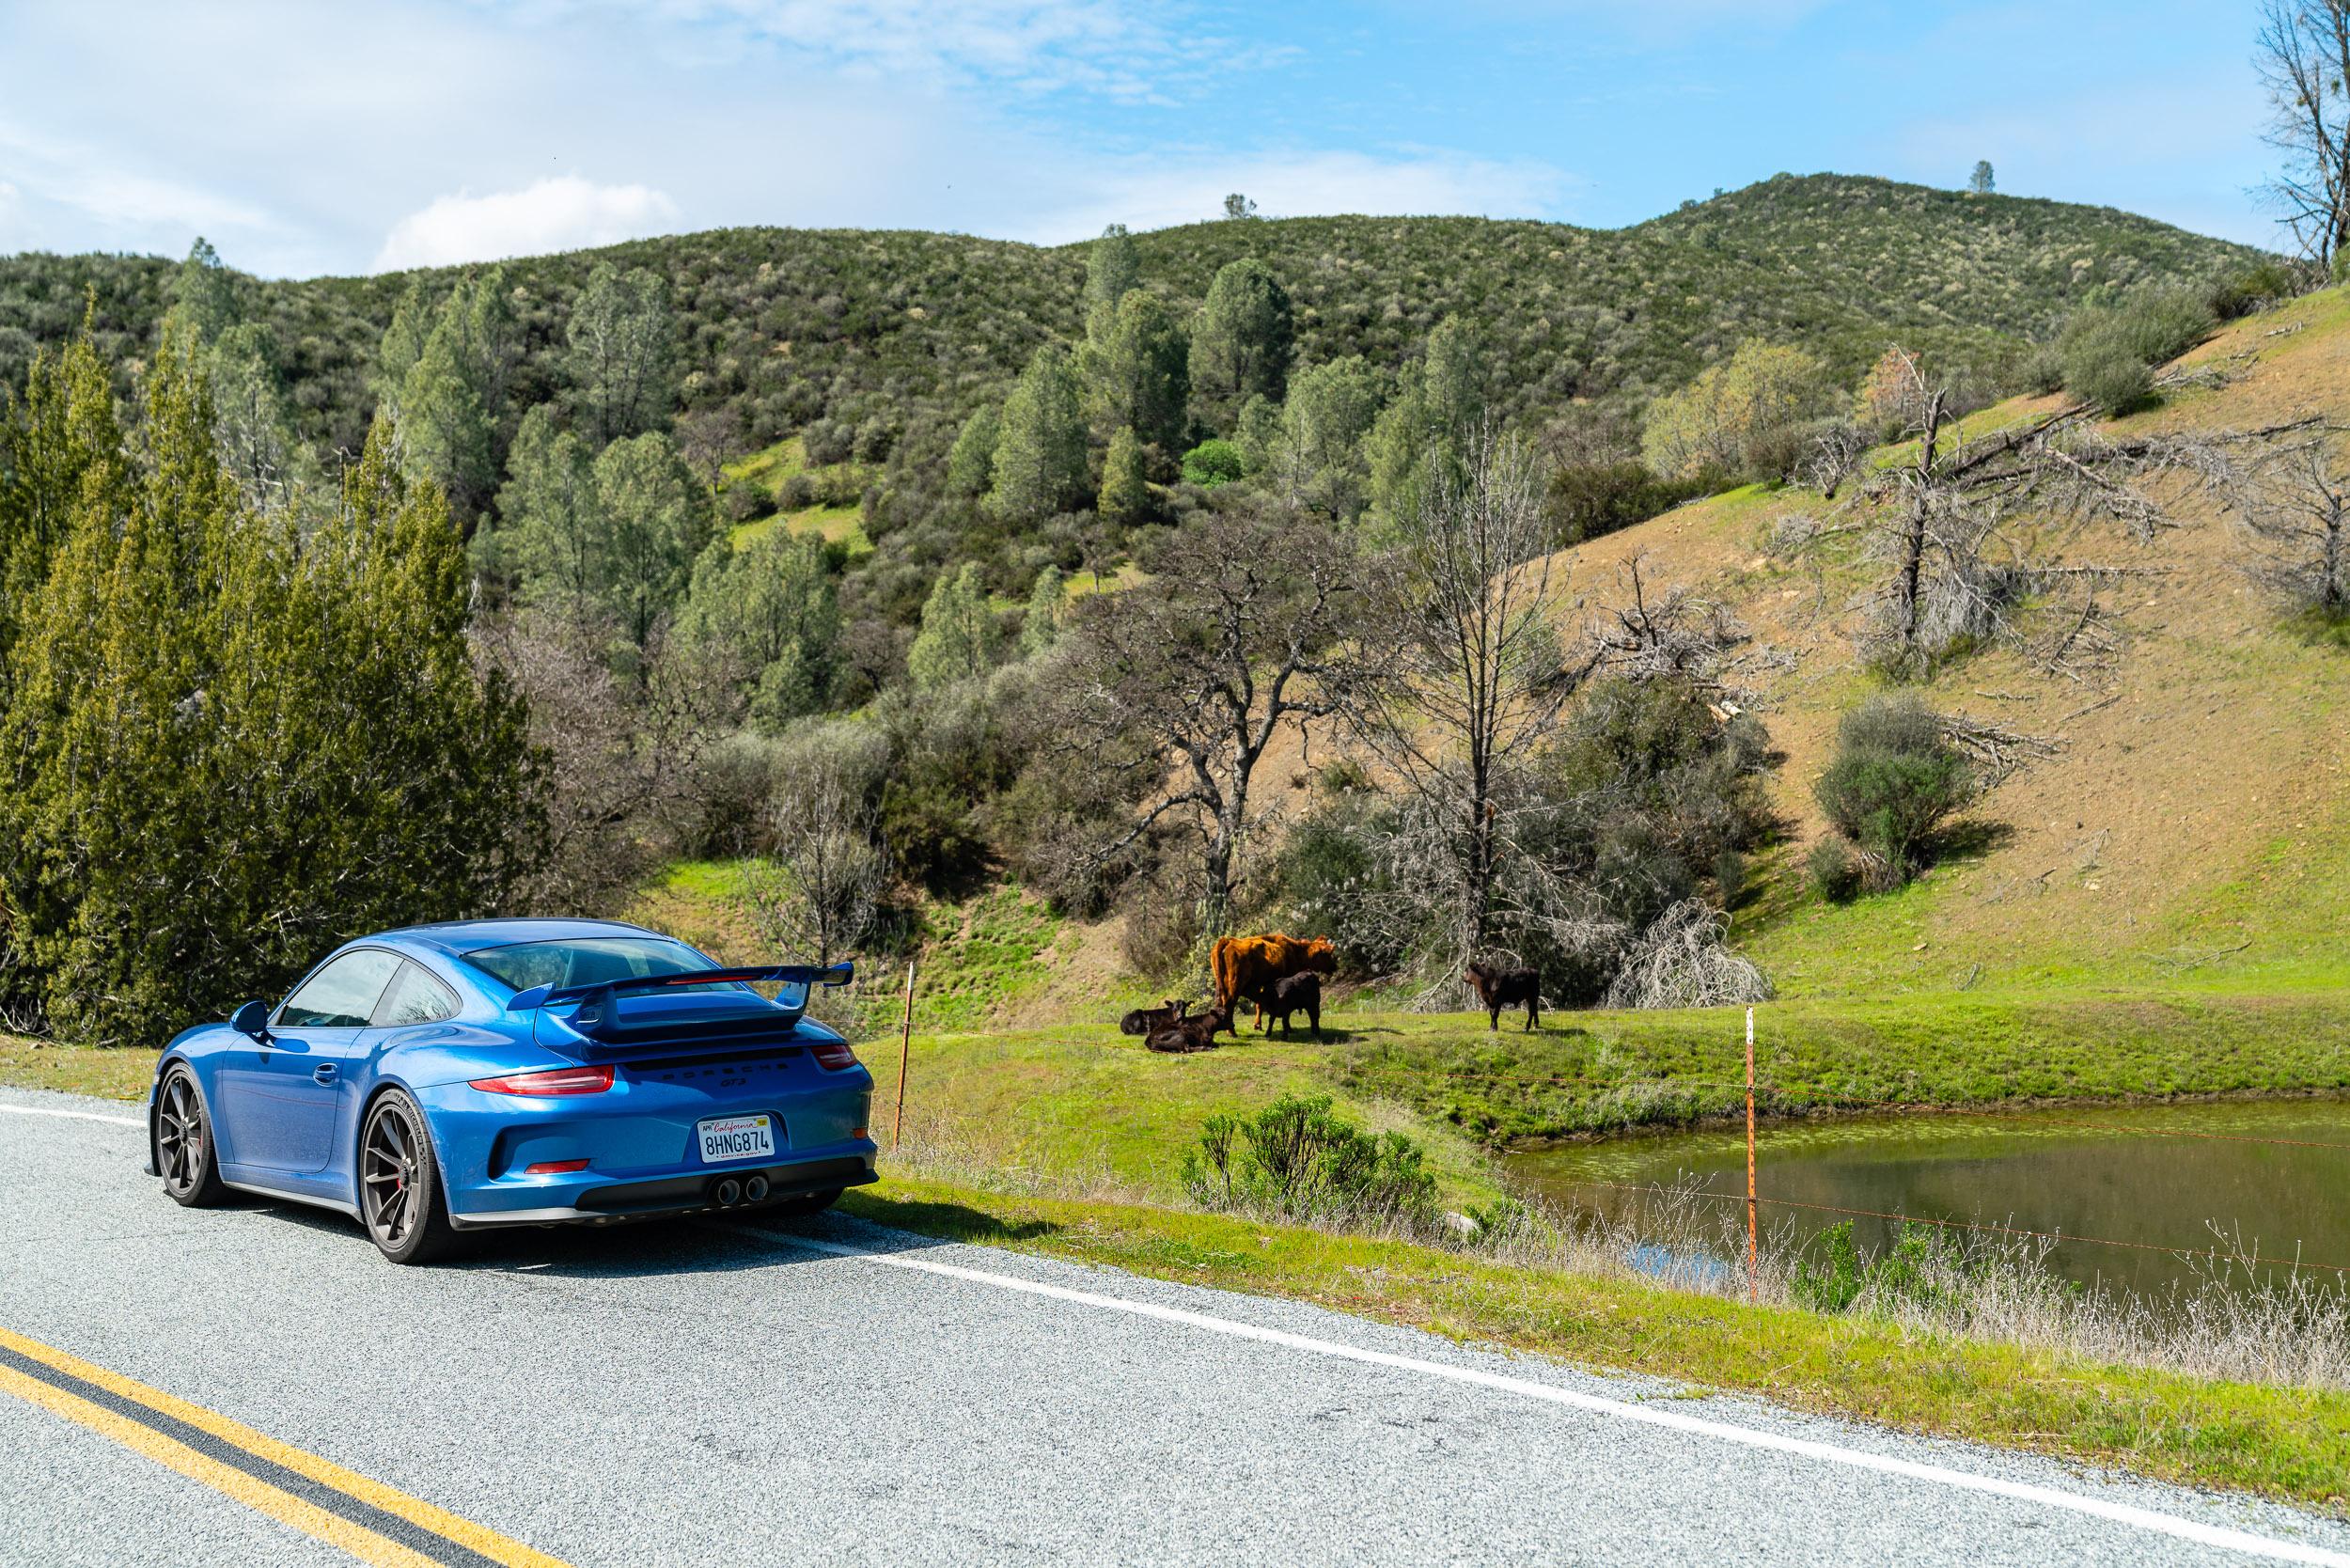 porsche-gt3-mines-road-cows.jpg